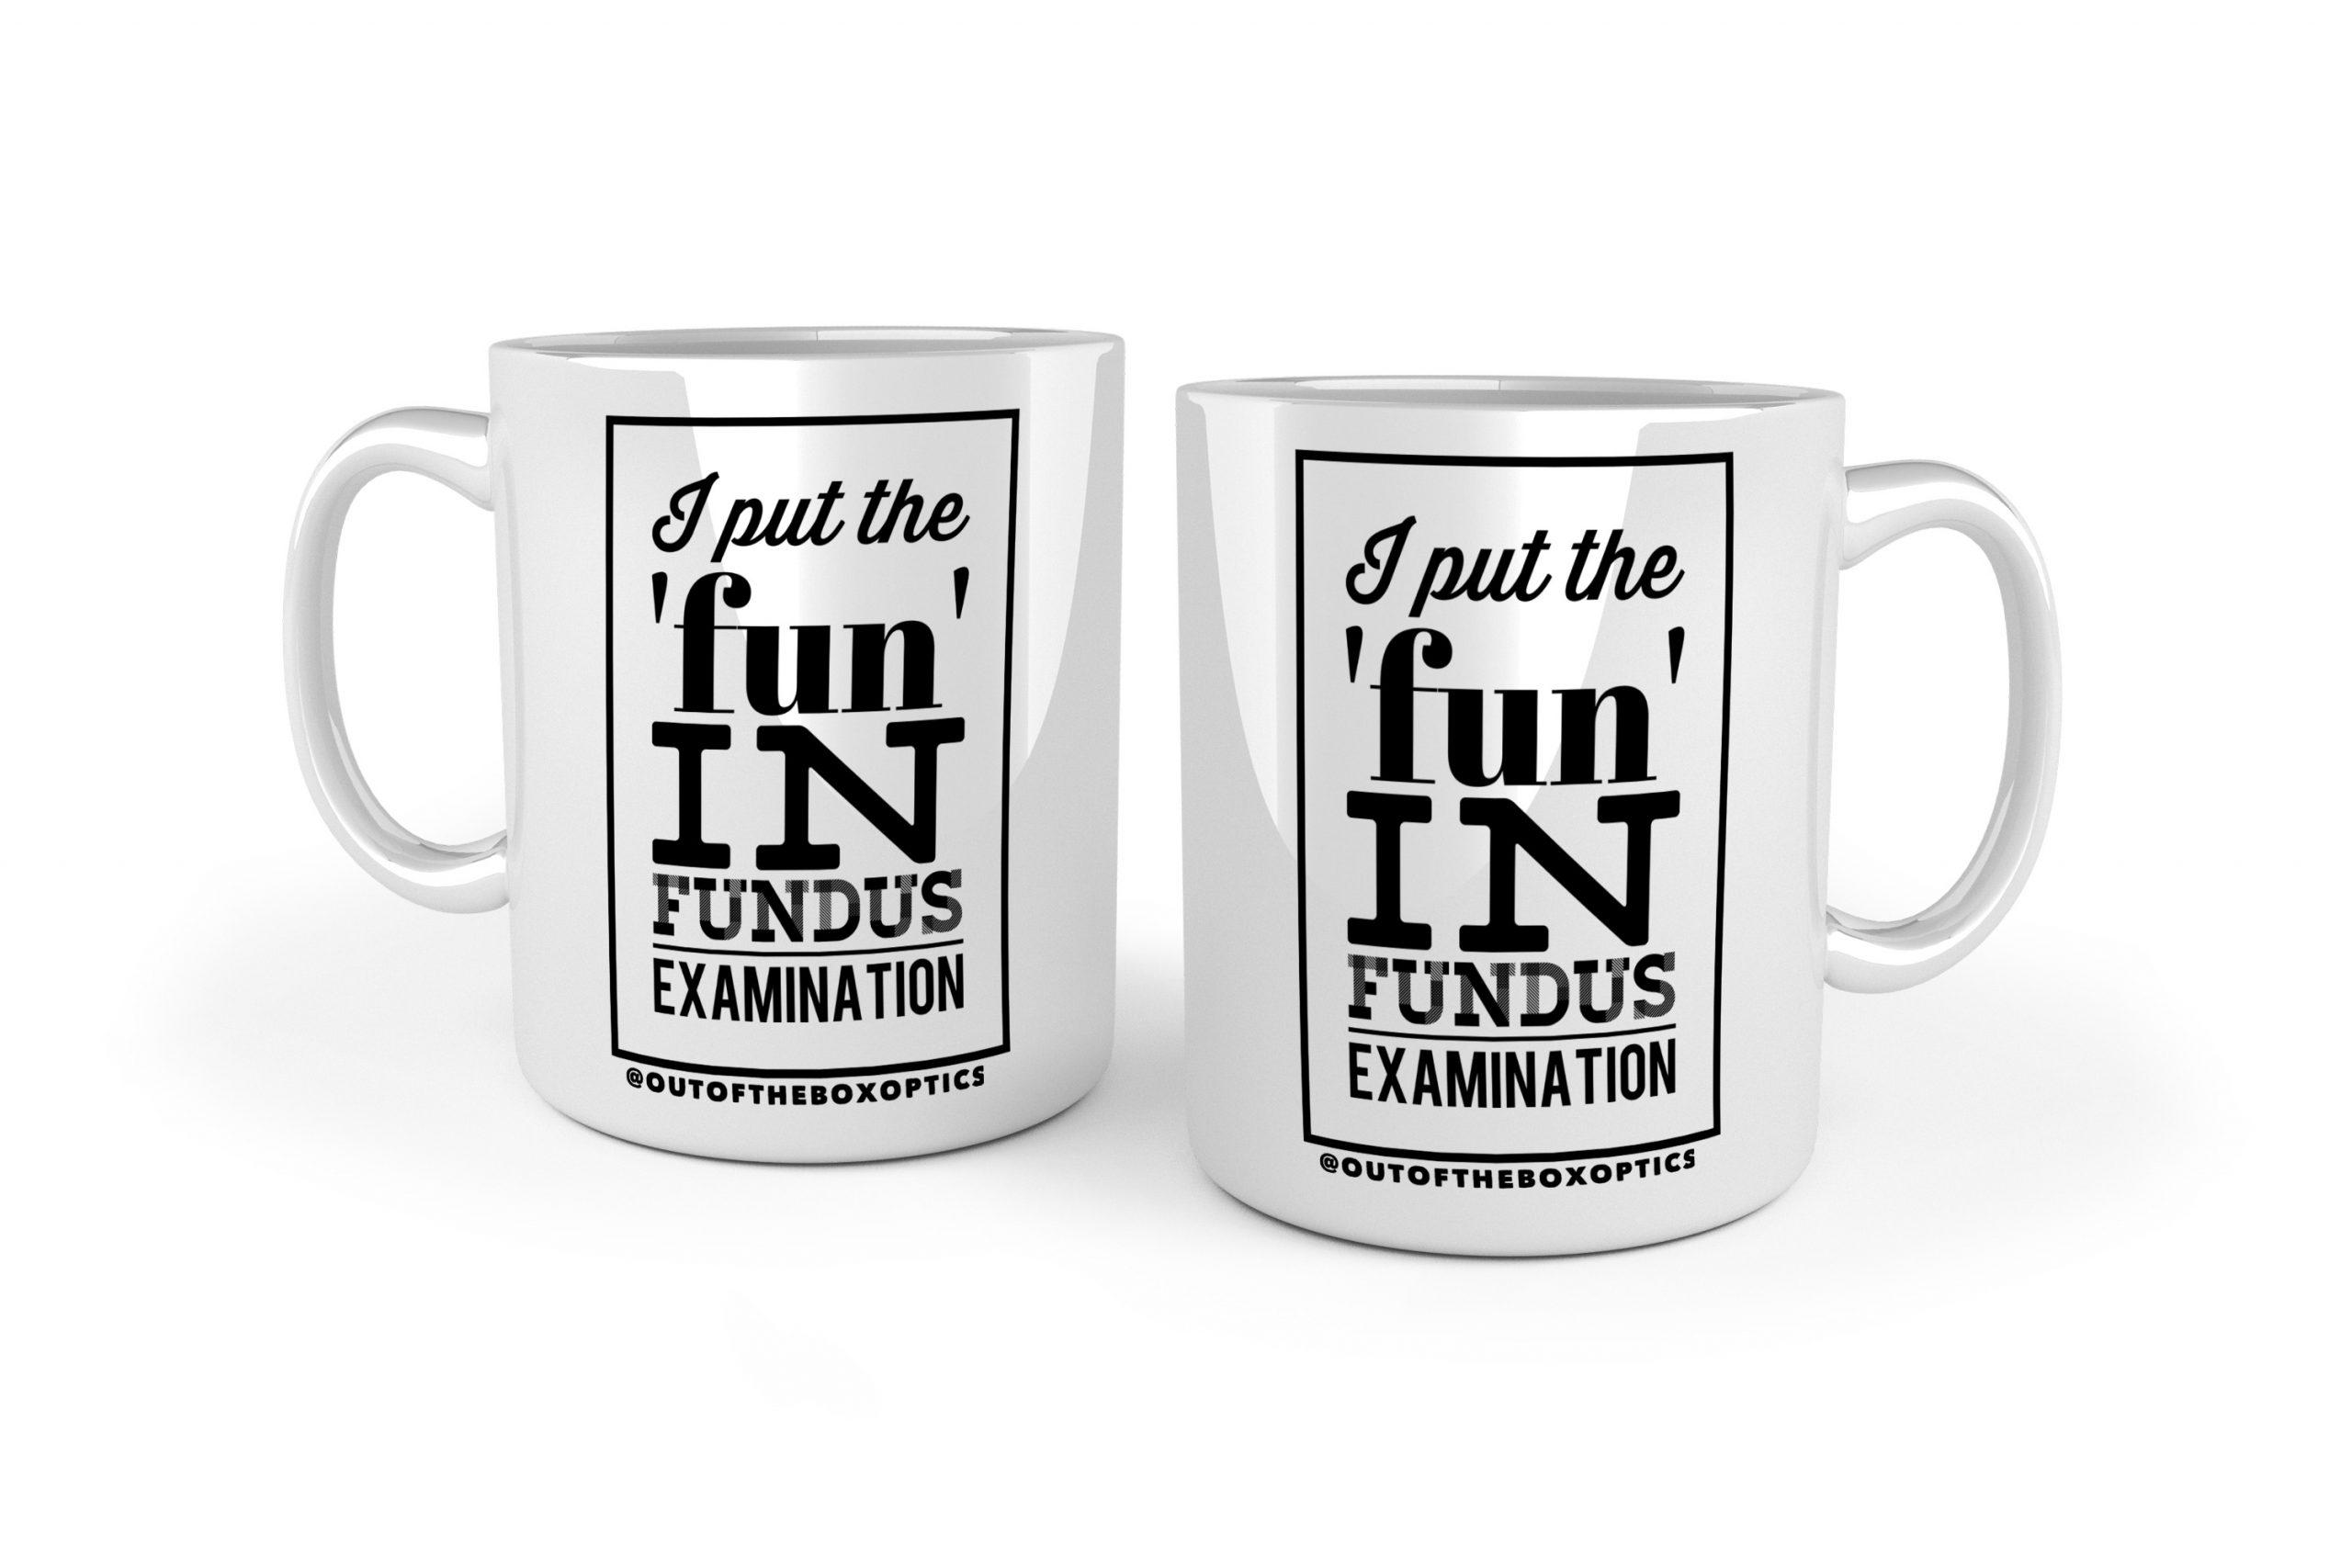 'Fun' In Fundus Examination – Ceramic Mug MK2